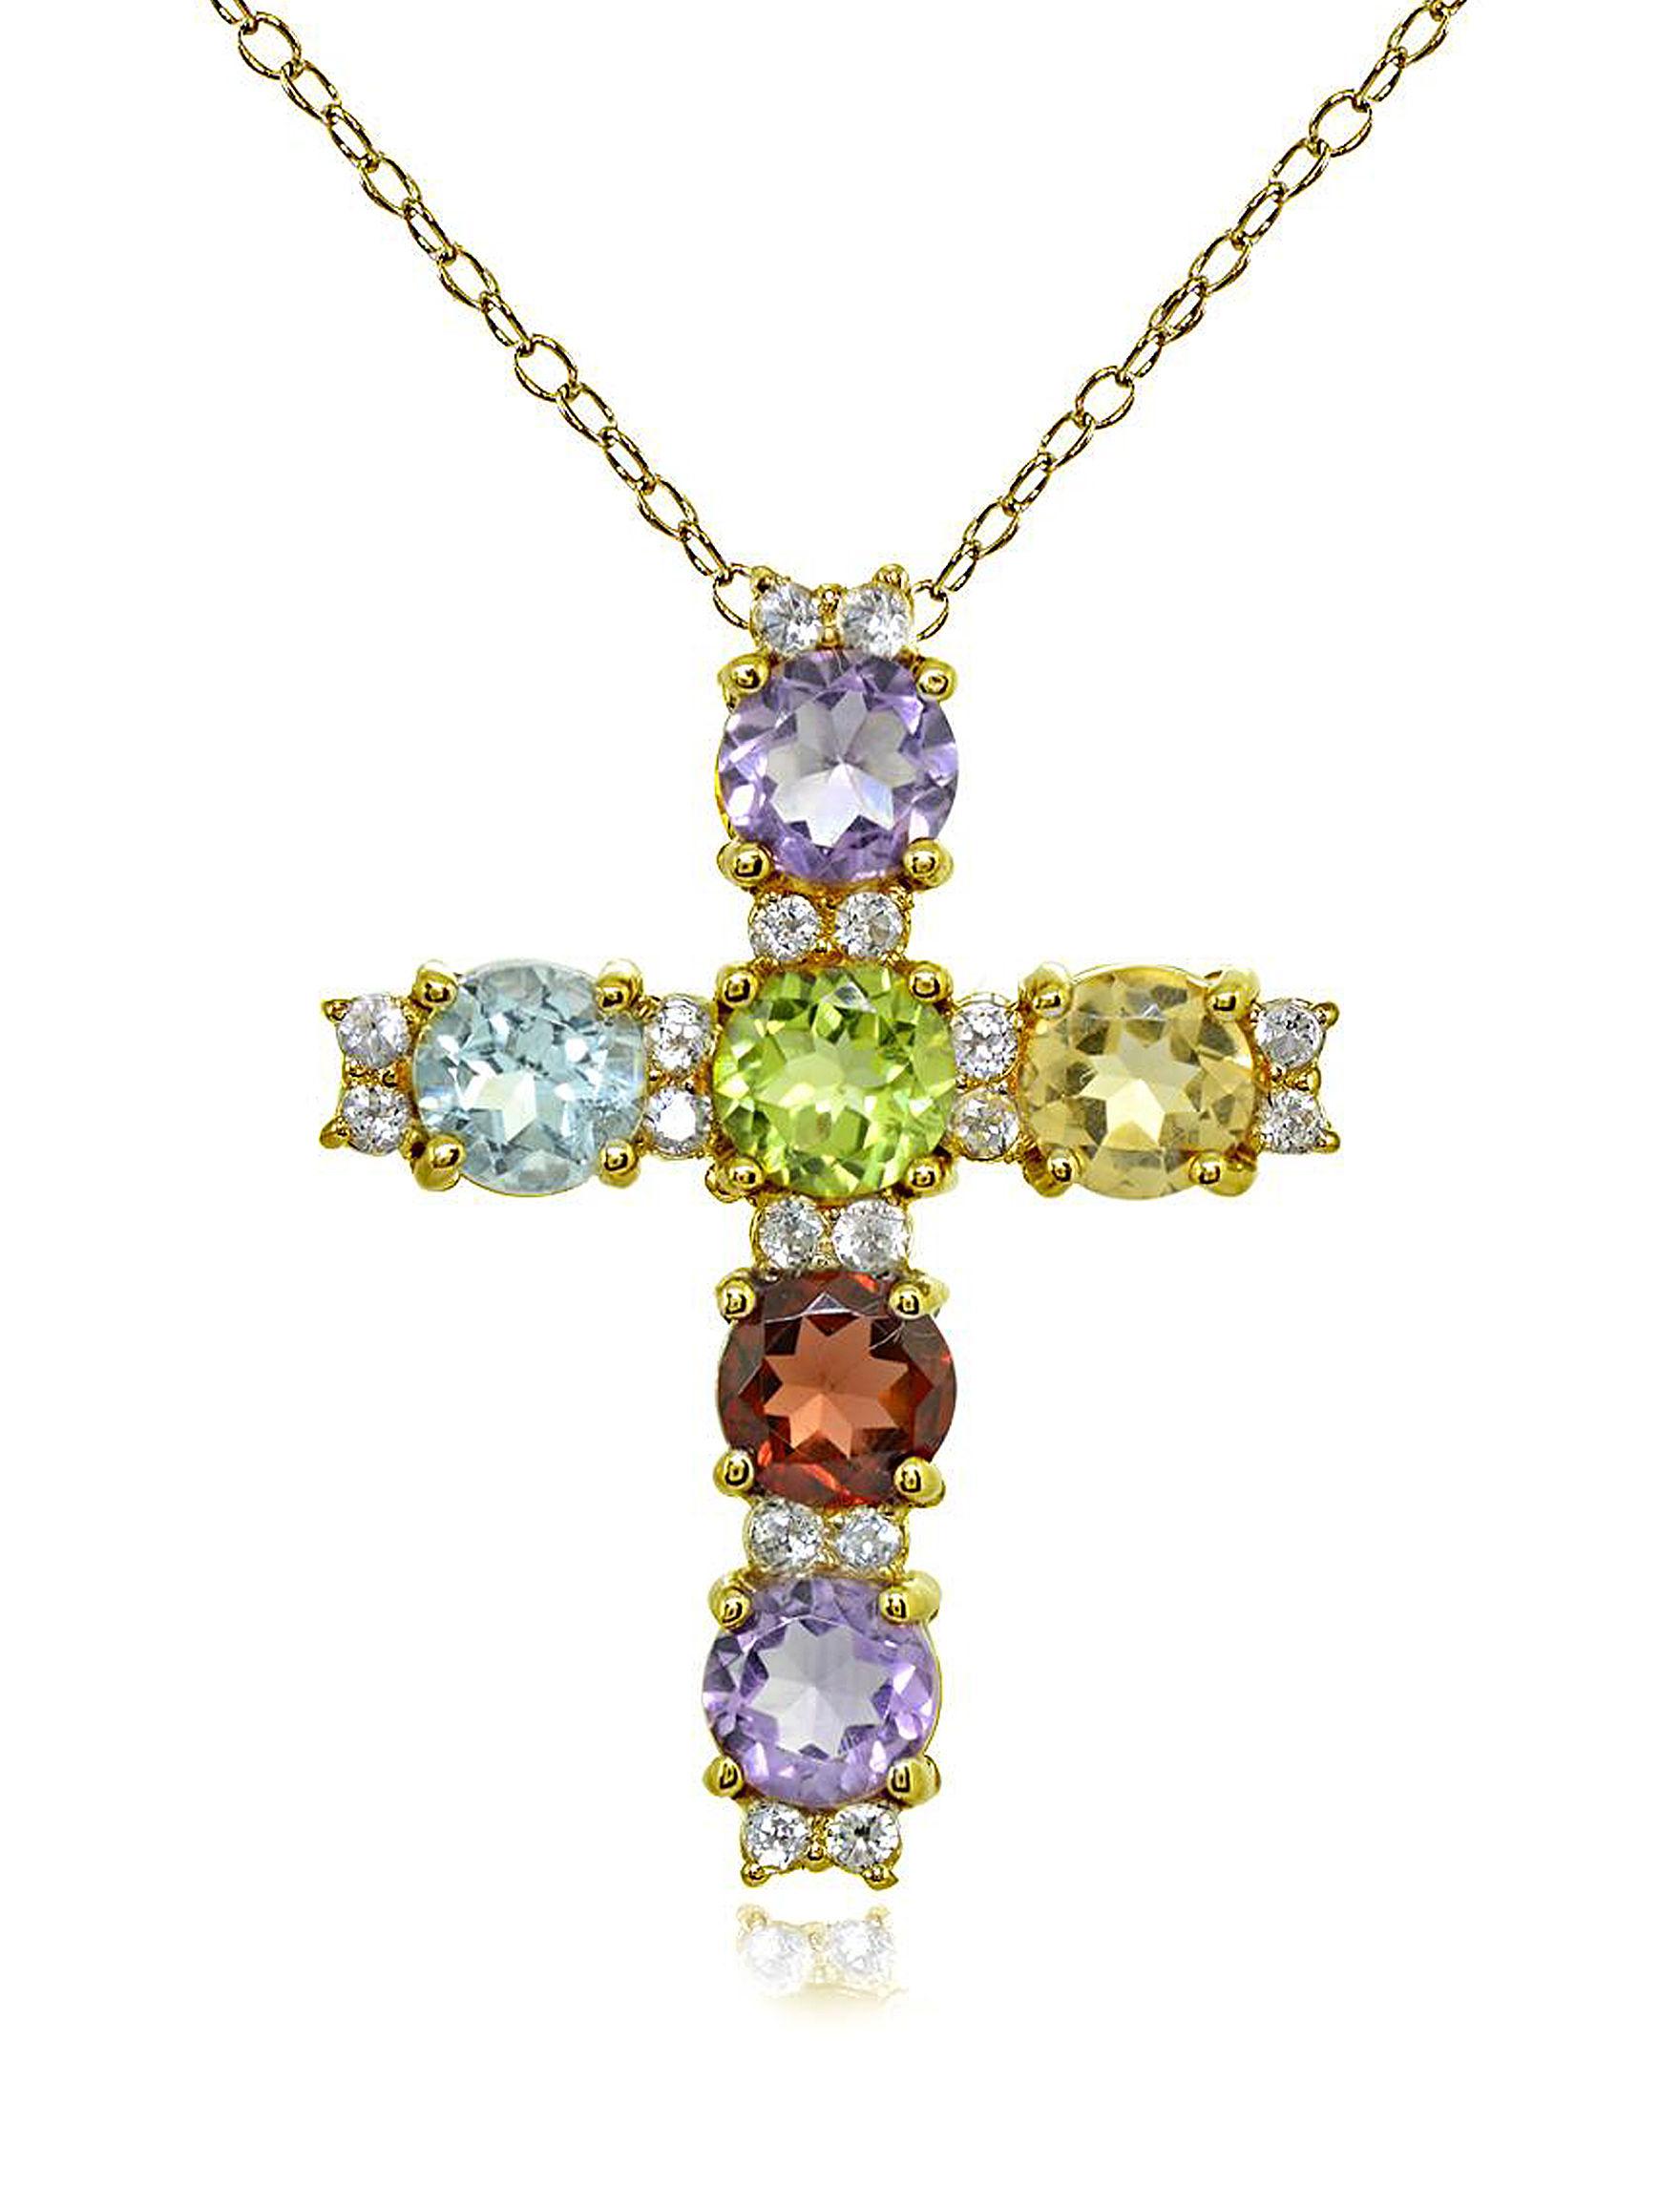 FMC Gold / Gemstone Necklaces & Pendants Fine Jewelry